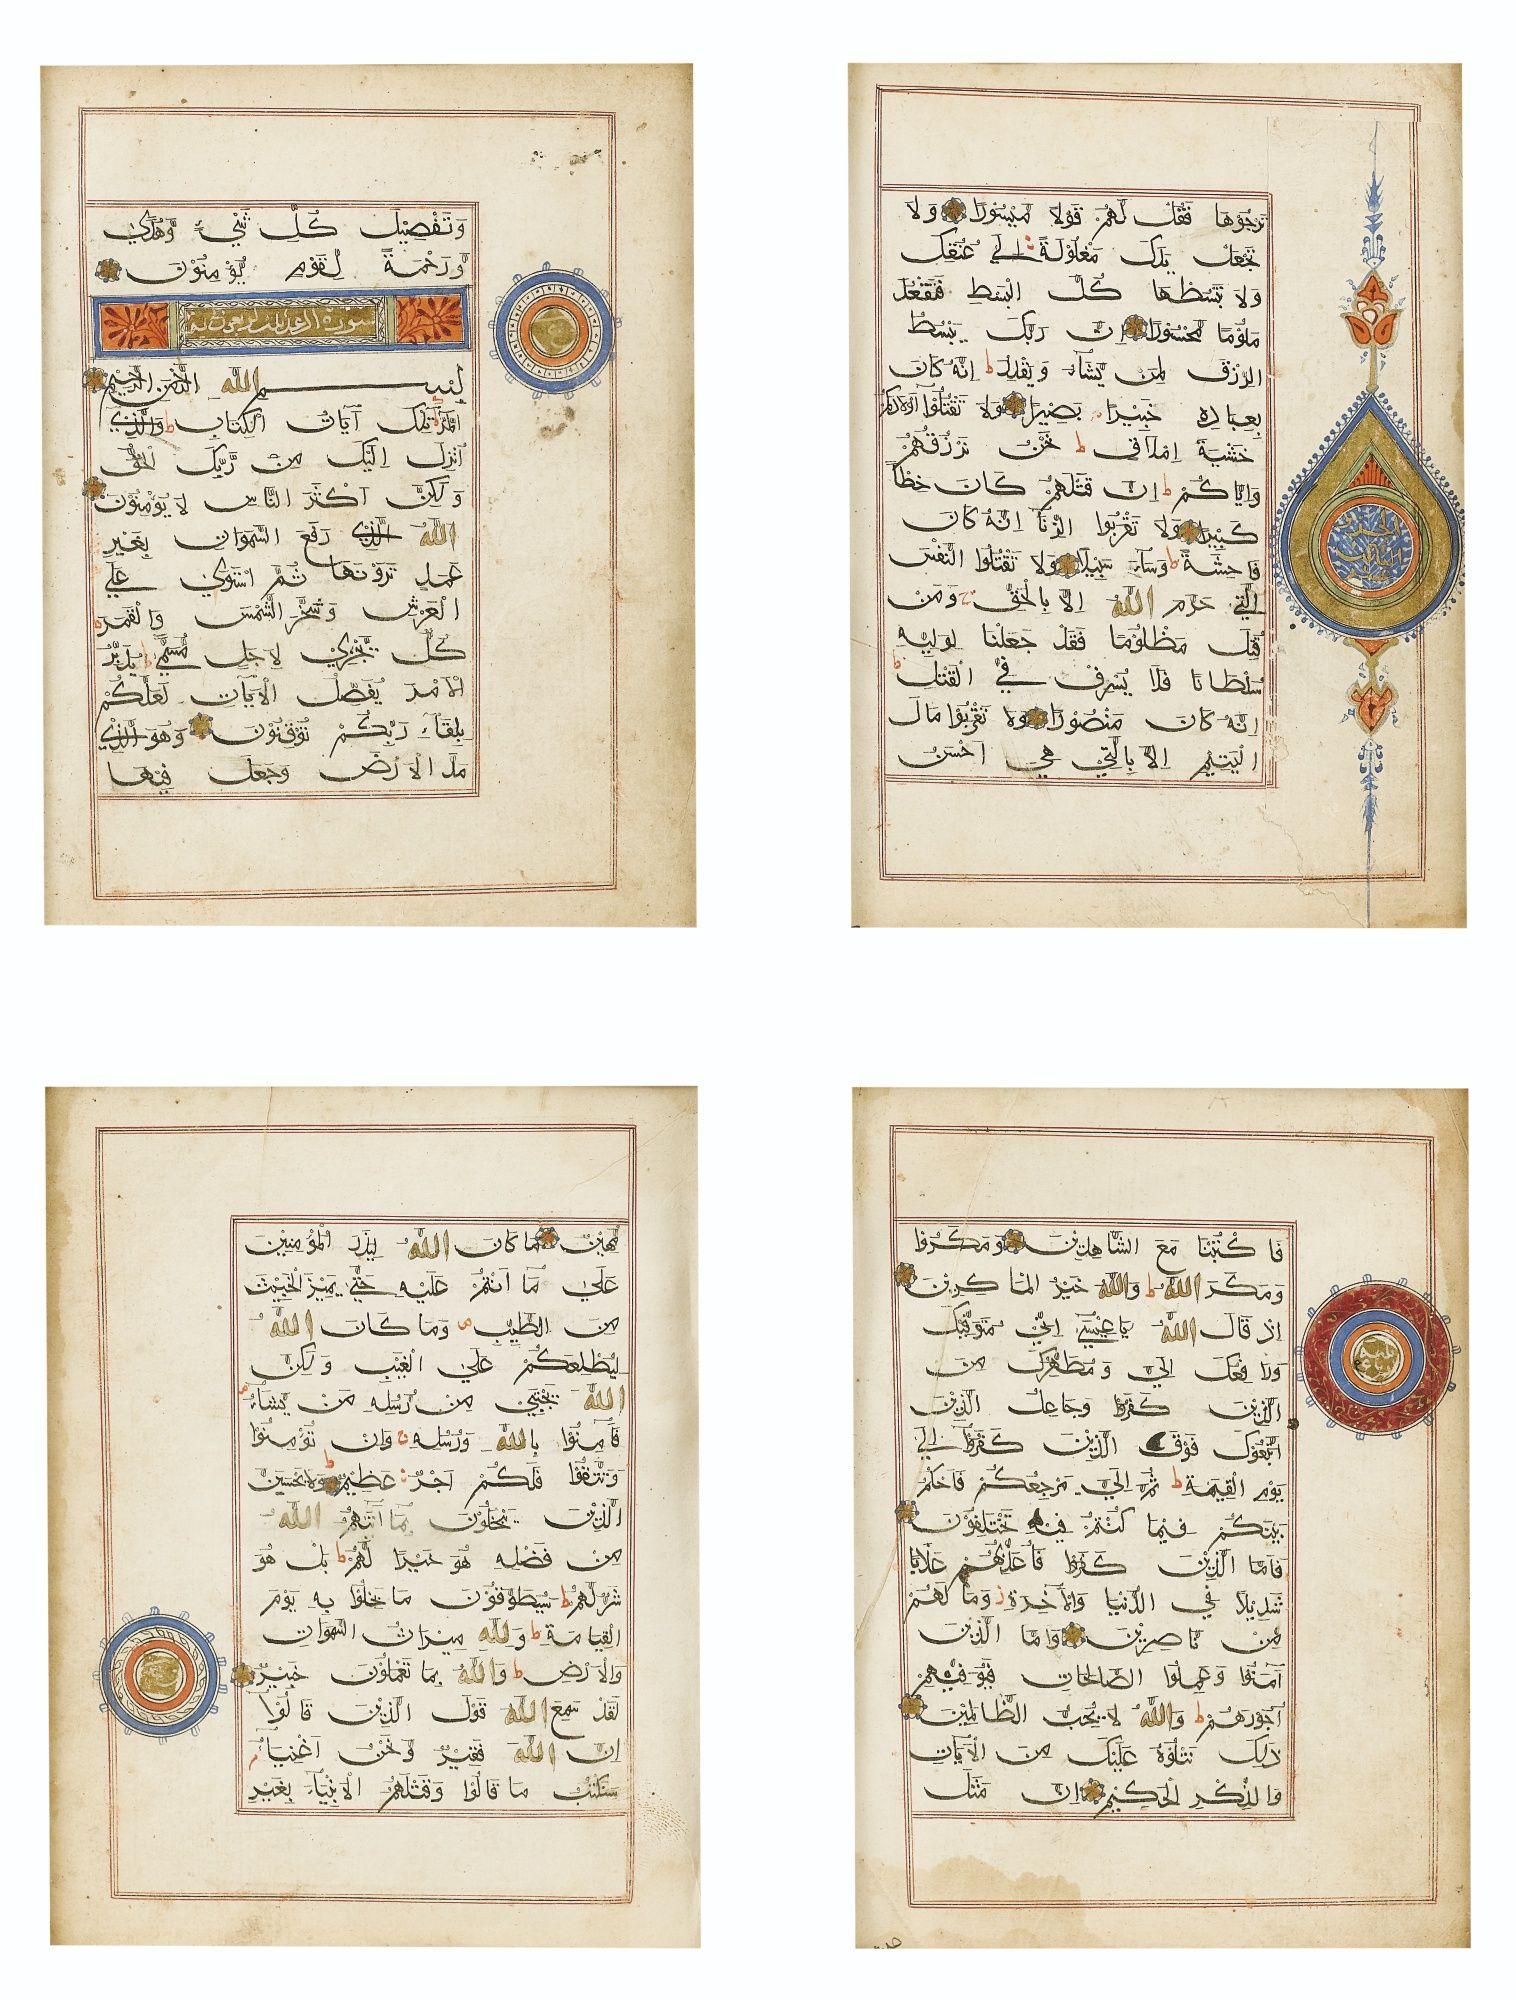 Quatre Pages D Un Coran Miniature Inde Sultanate Xv Sup Eme Sup Siecle Lot Sotheby S Book Art Coat Of Many Colors Quran Covers